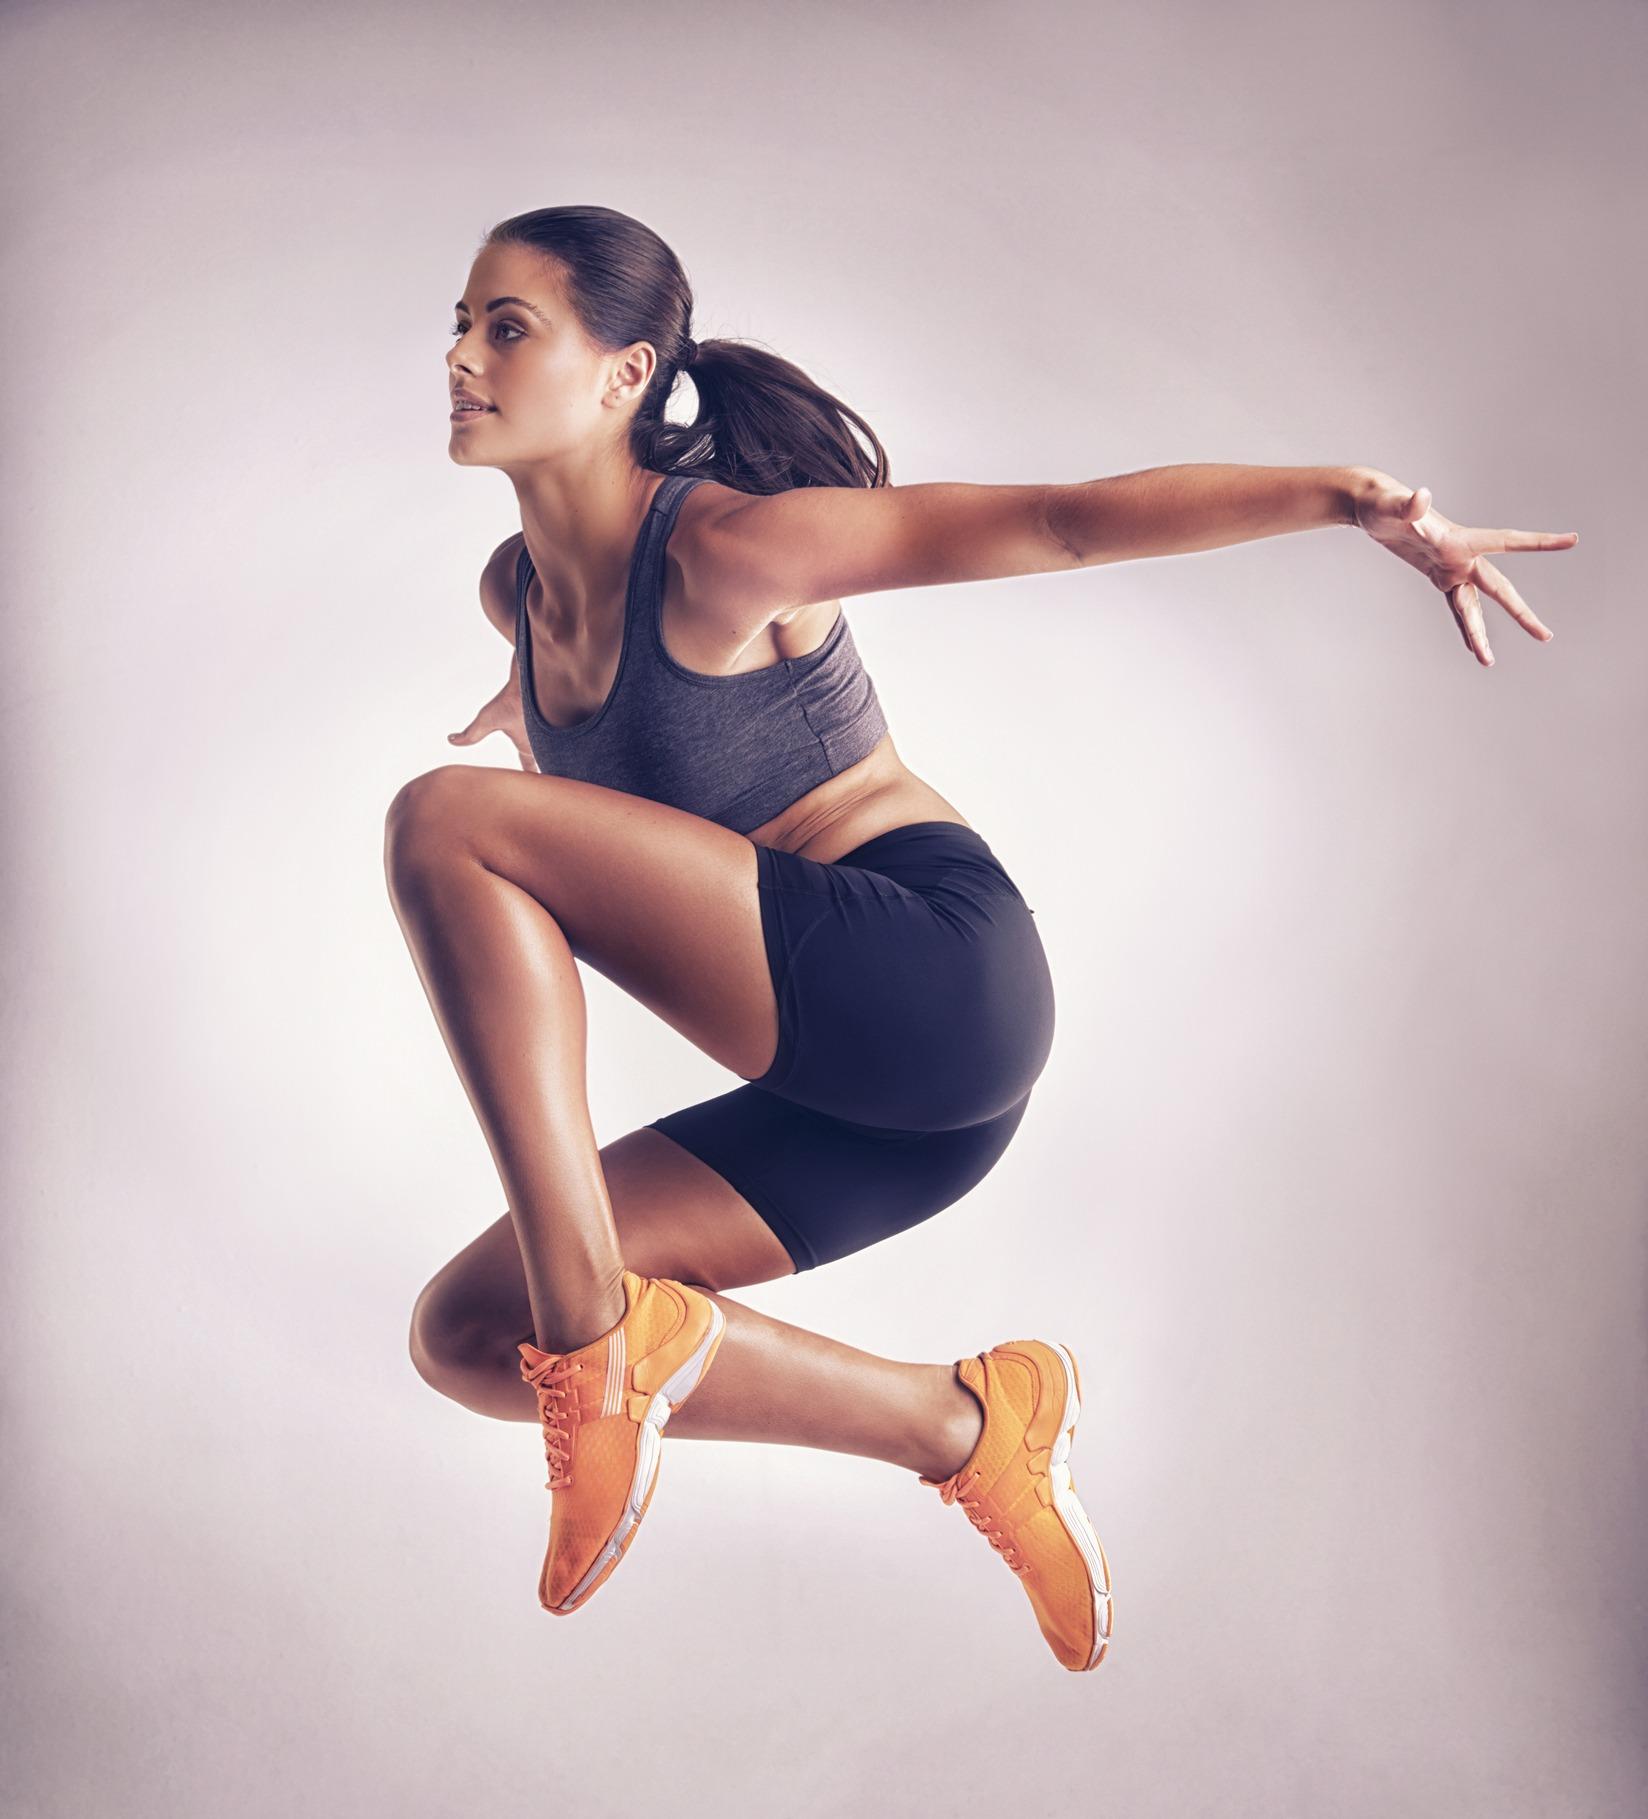 Orthopedic And Sports Medicine